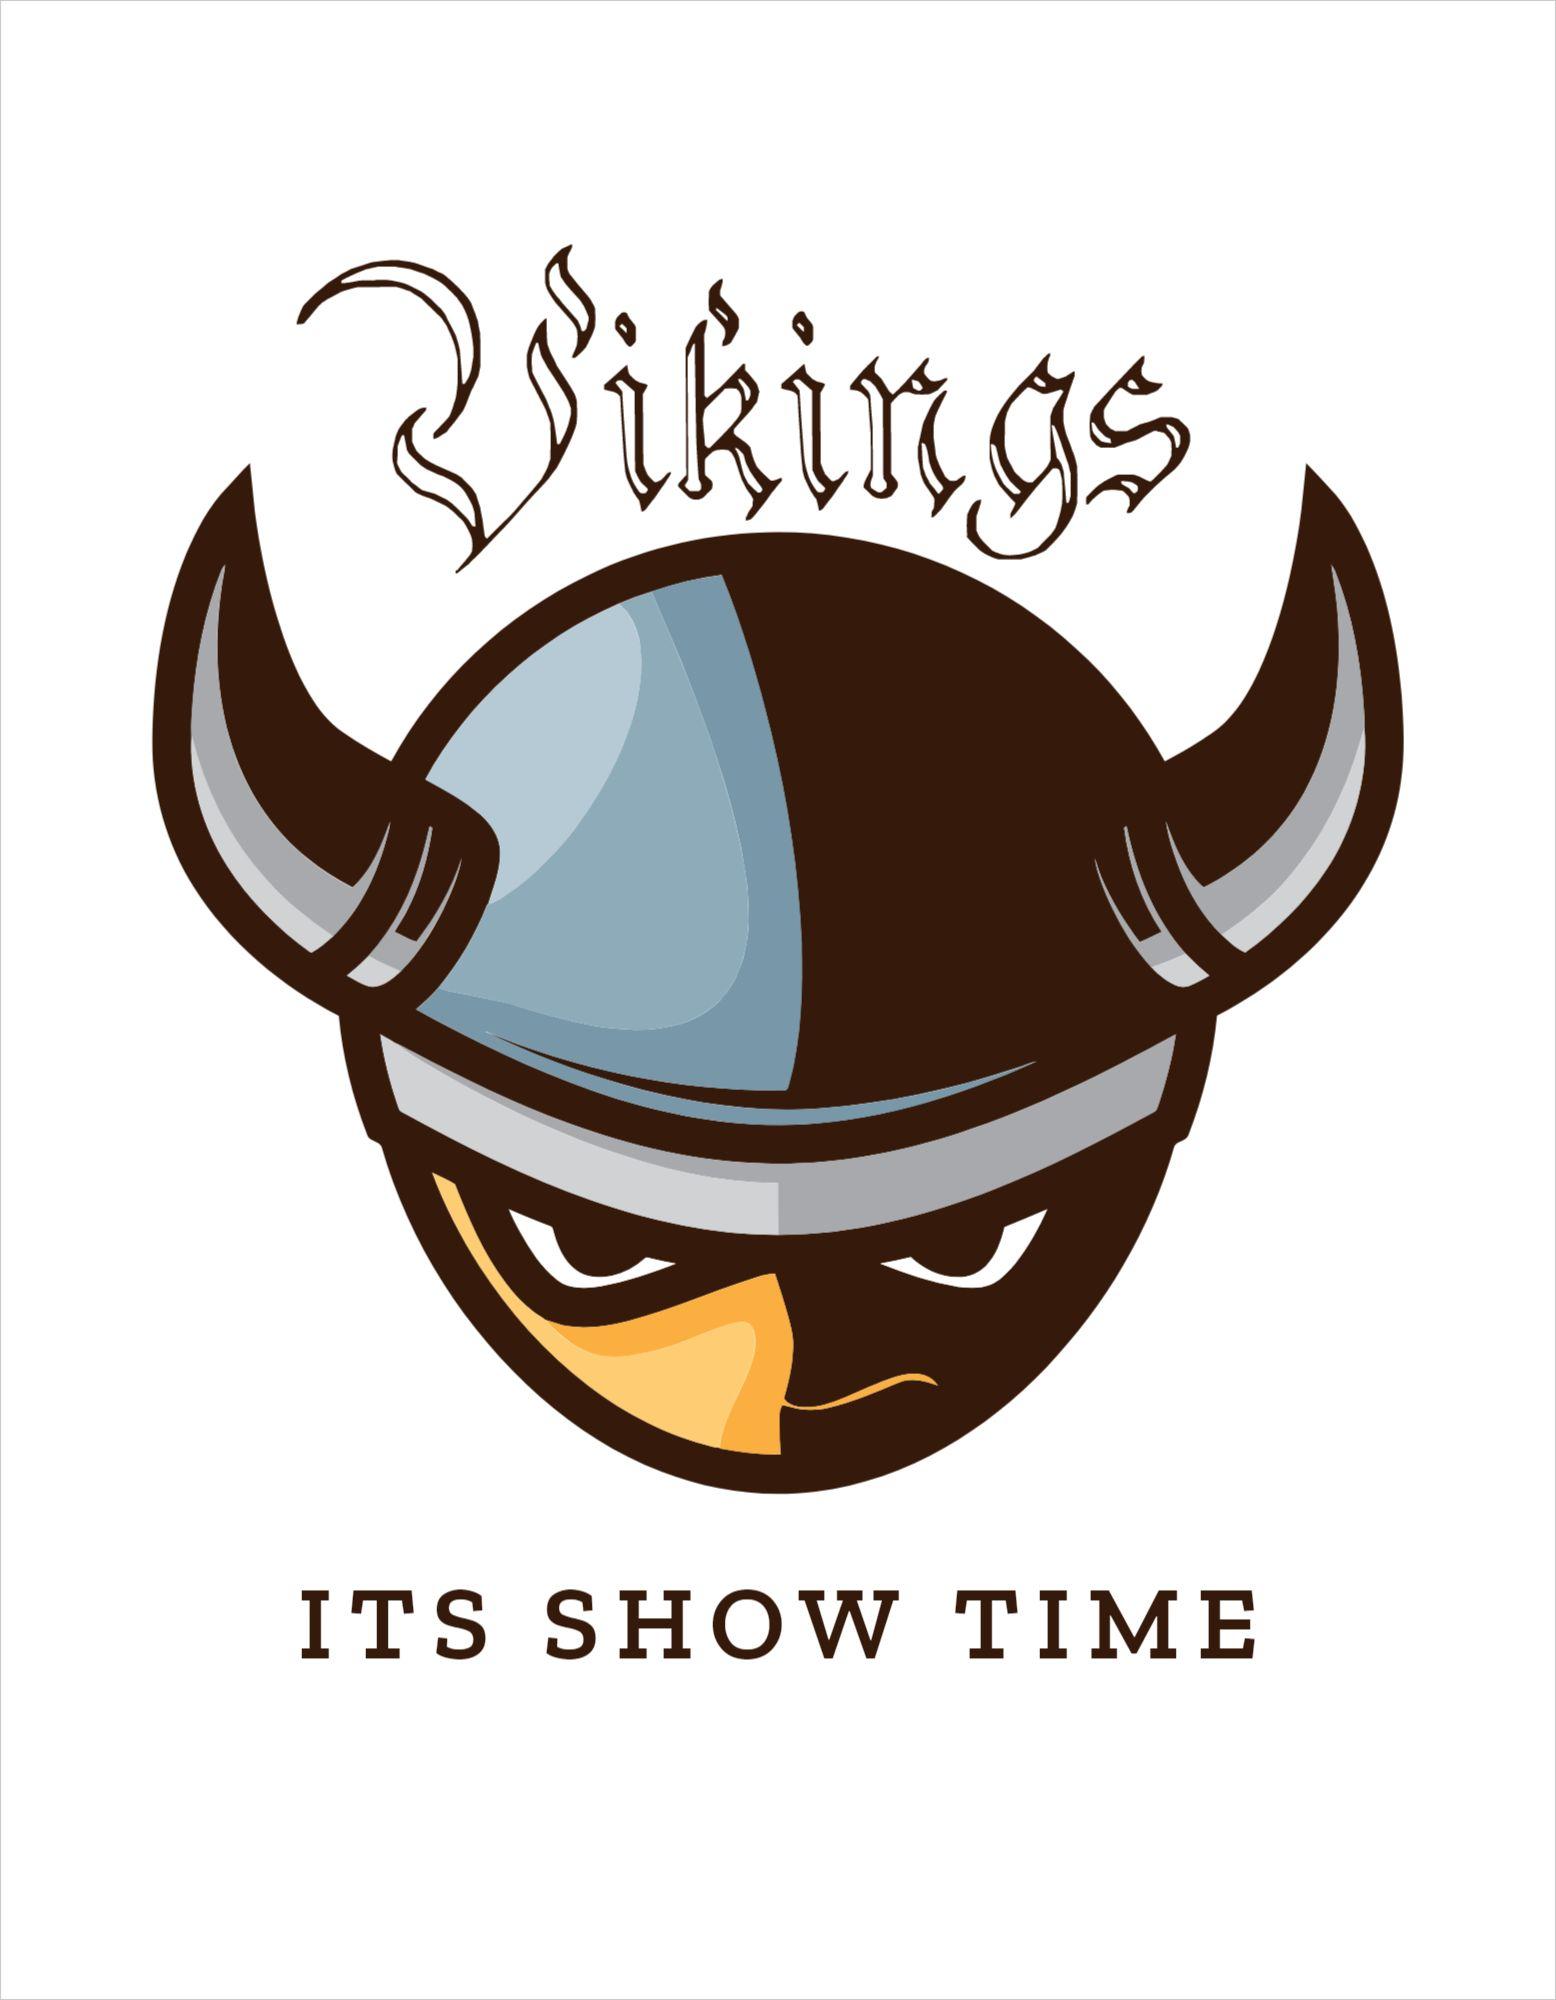 Vikings Themed T-Shirt Design Template